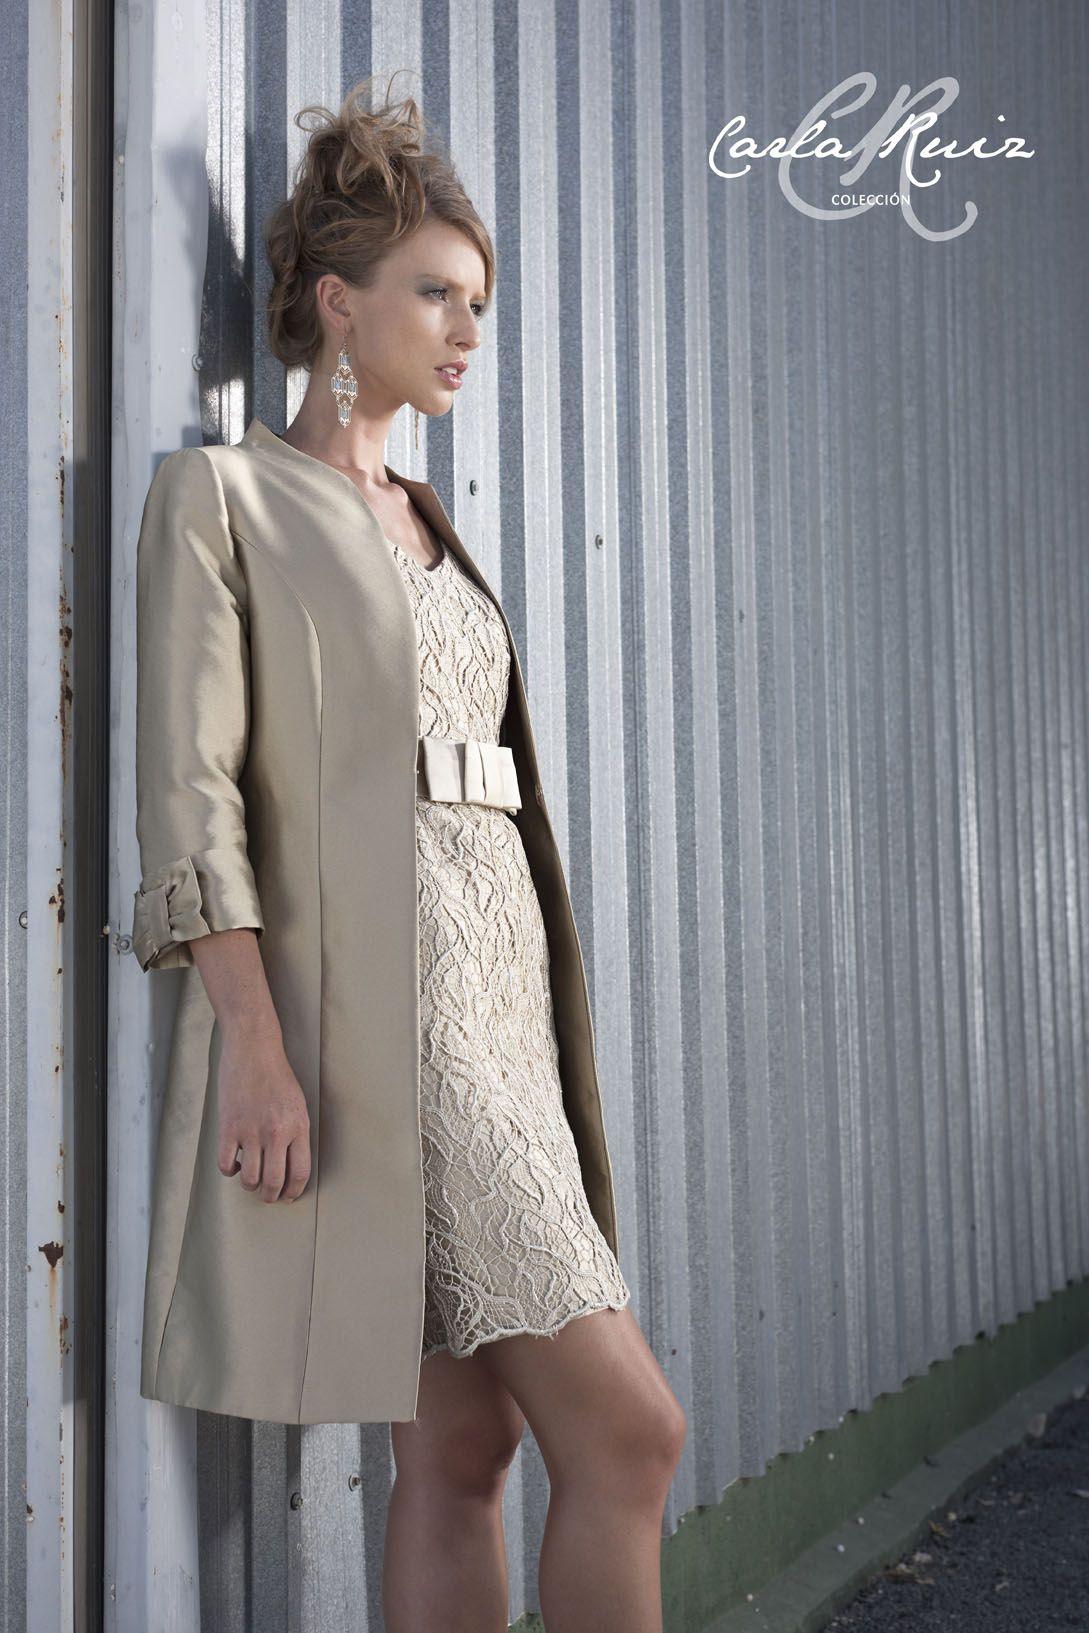 Vestido de Madrina de Carla Ruiz 2012 - Modelo 86233 | ELEGANTES ...